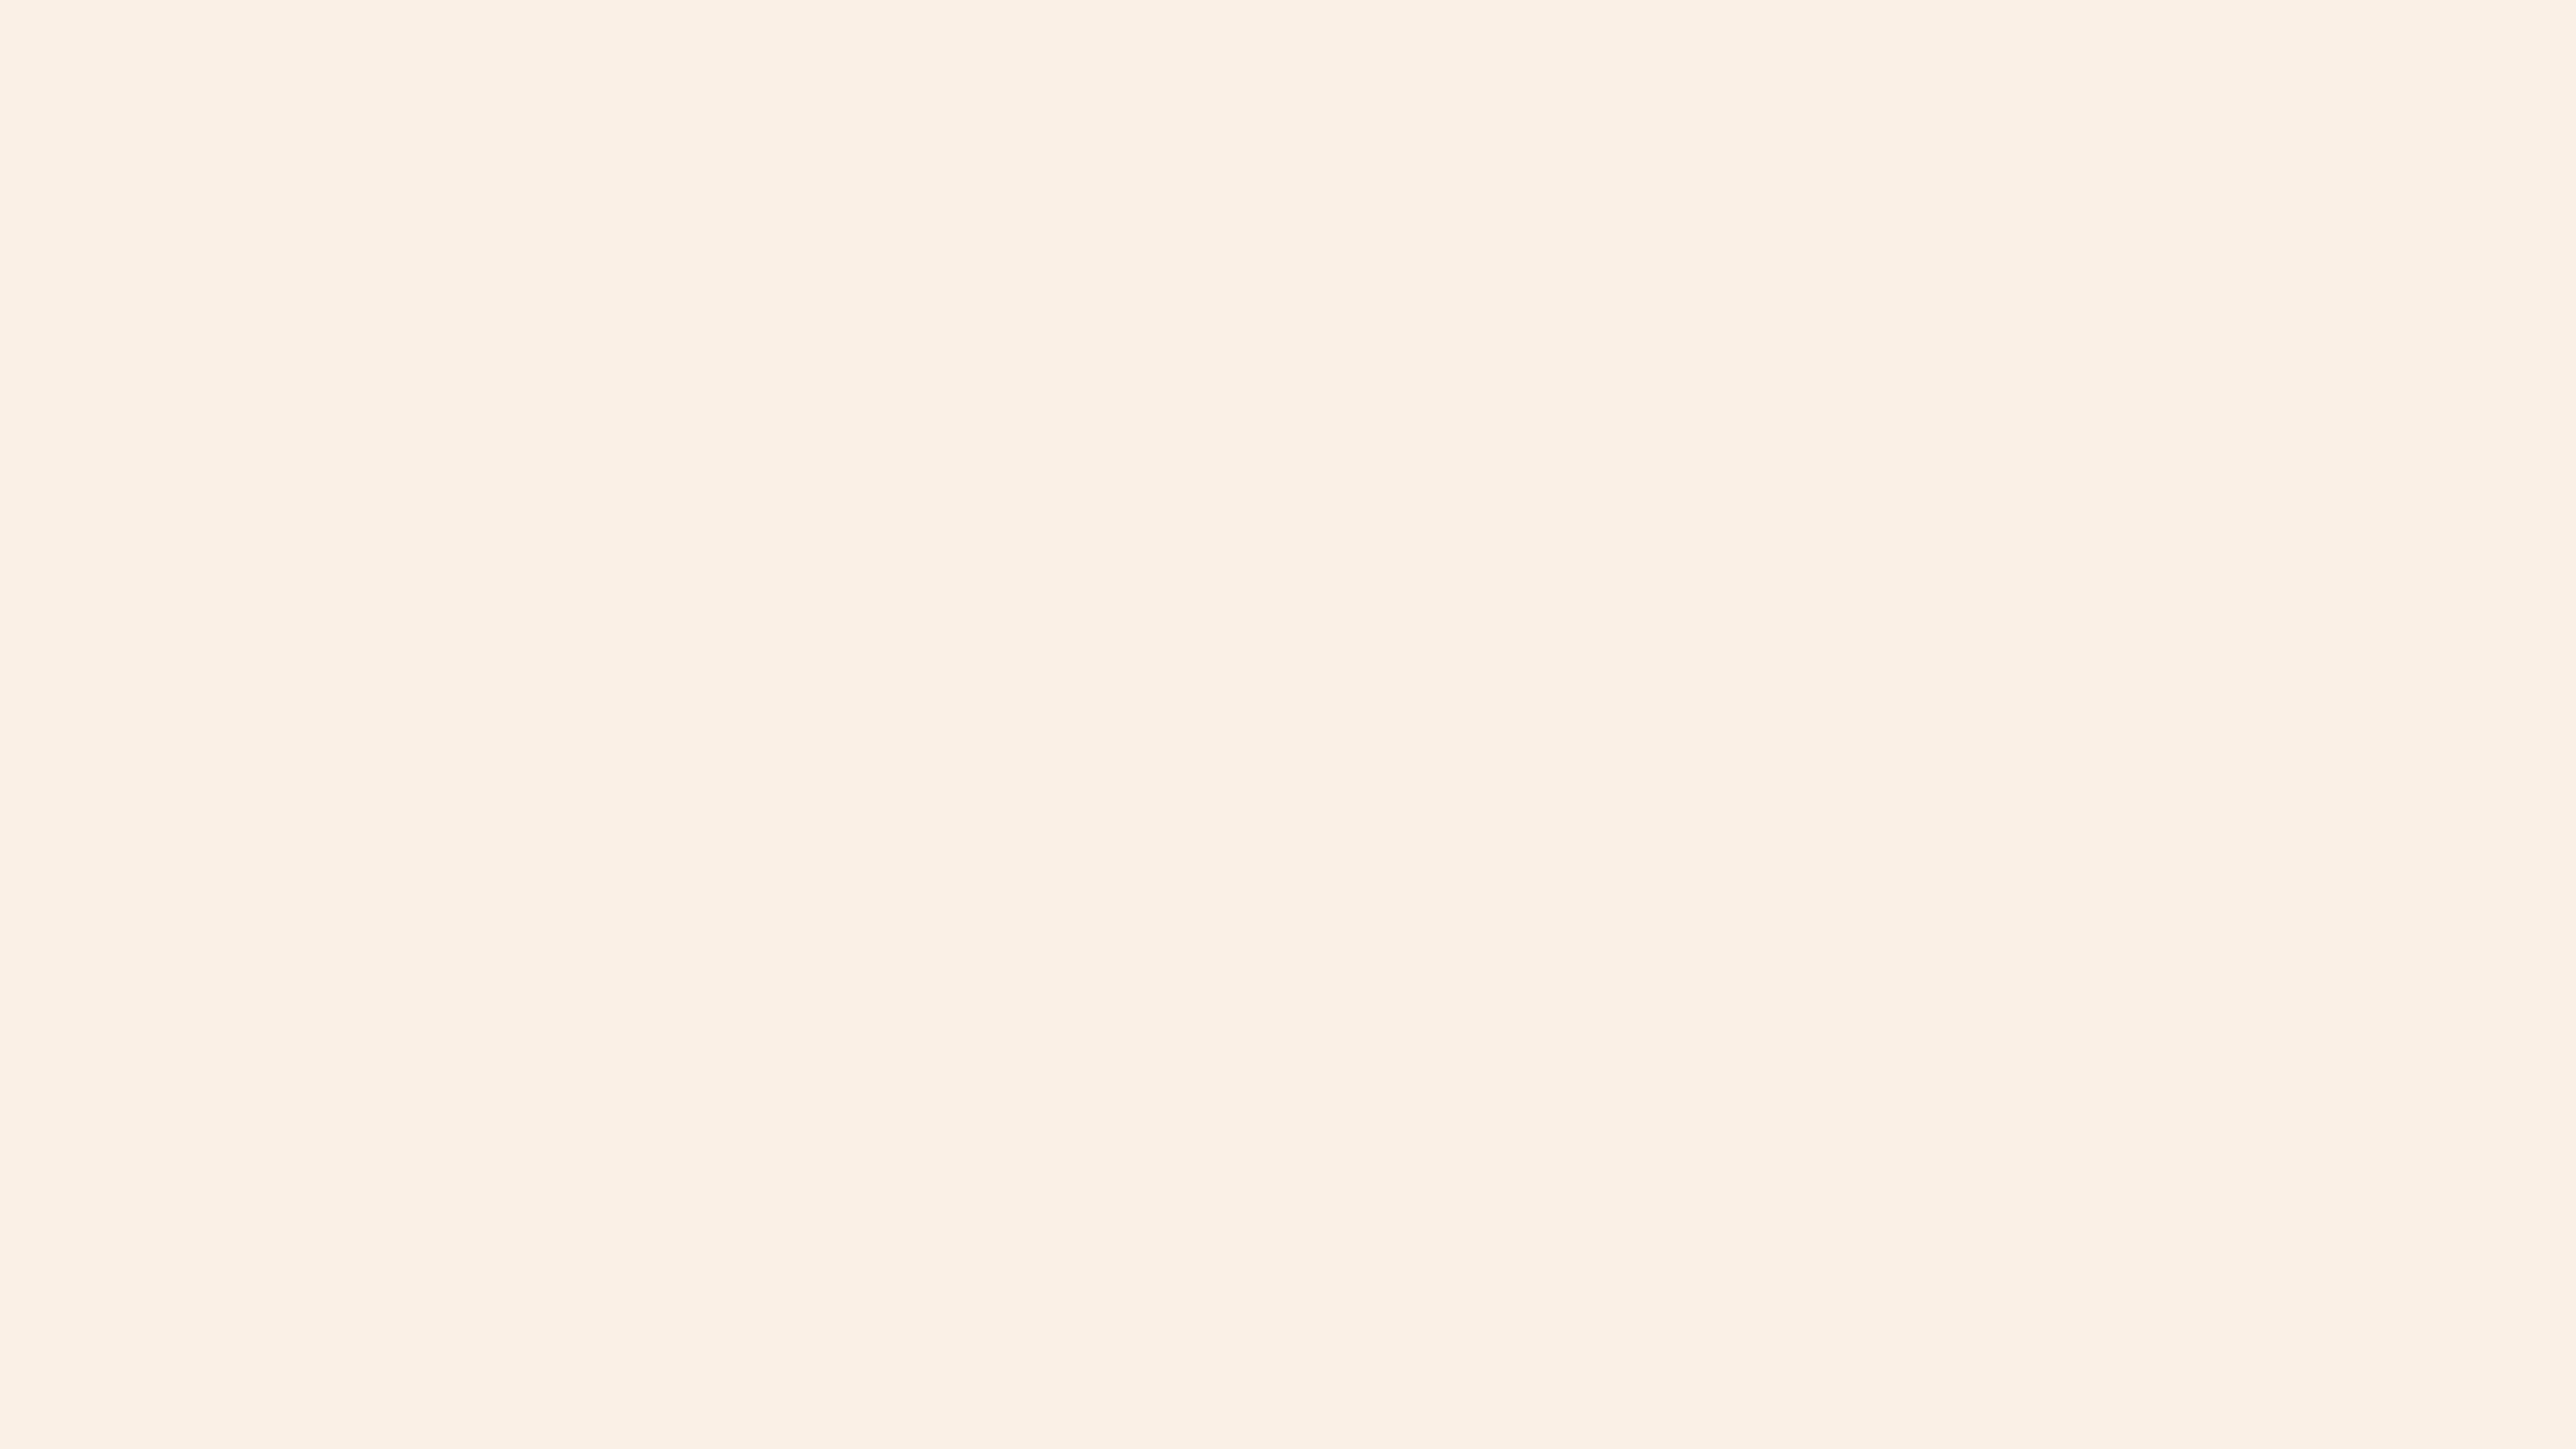 Linen Solid Color Background Wallpaper 5120x2880